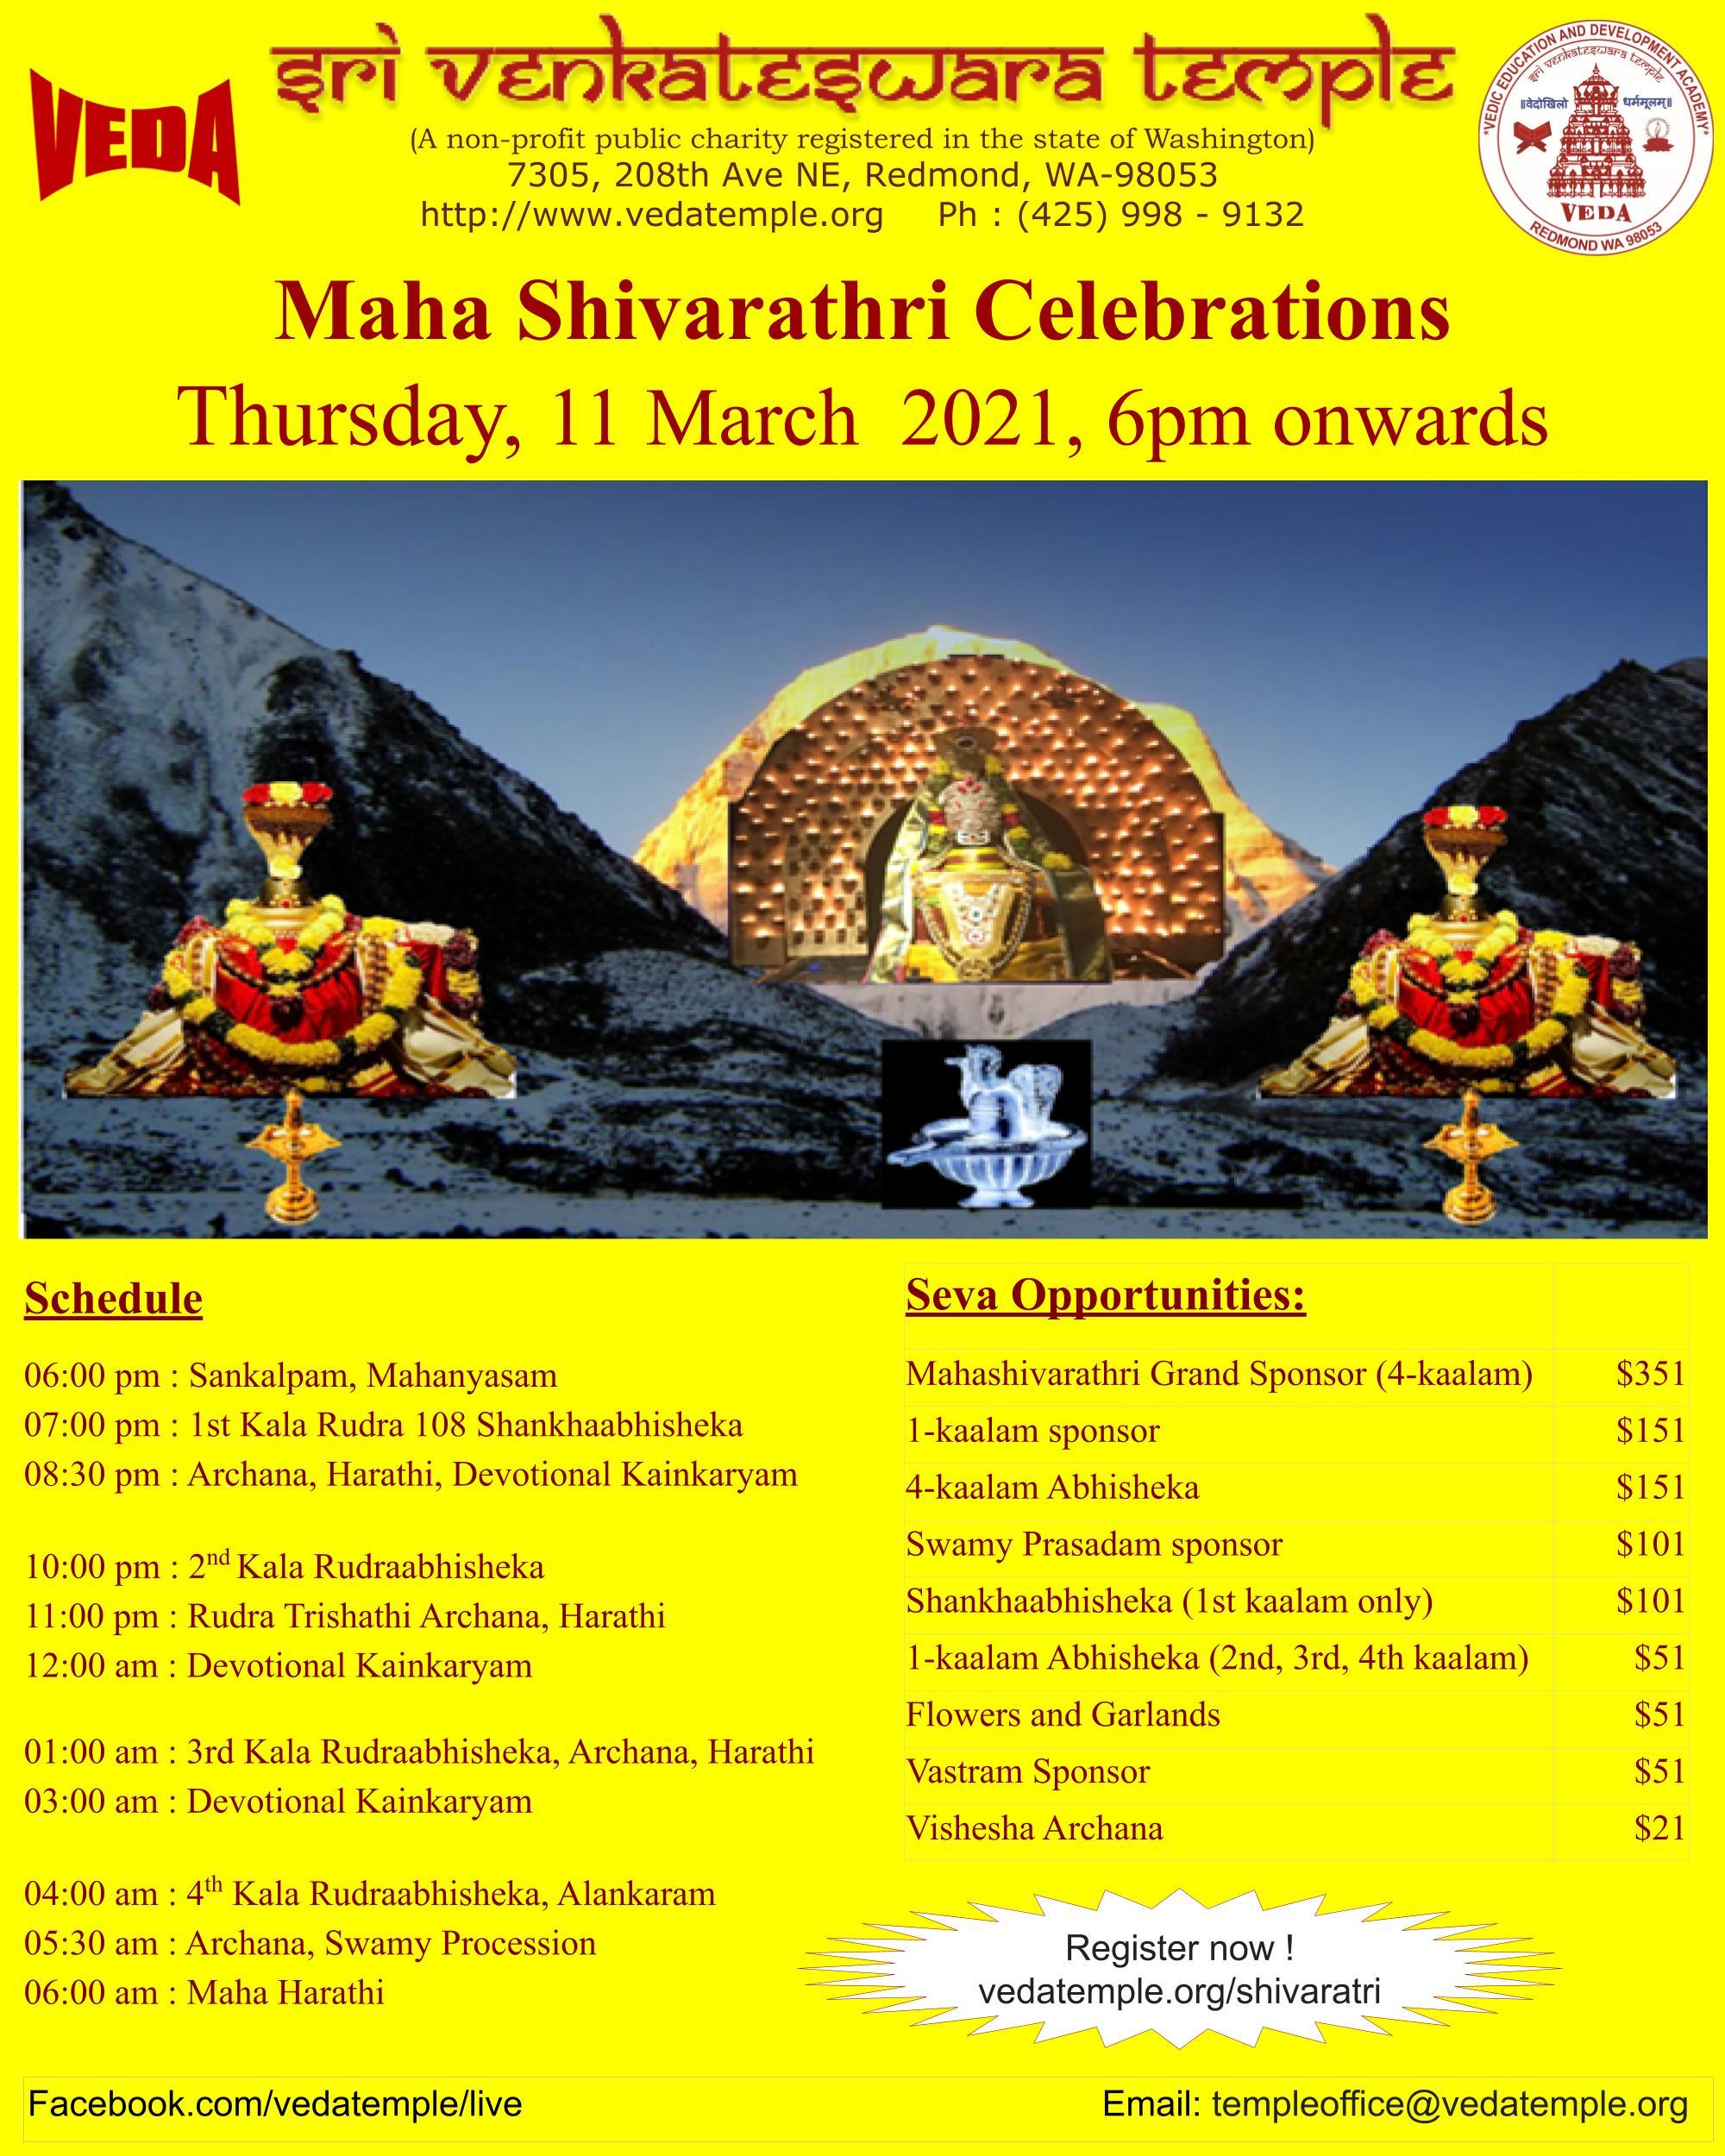 MahaShivarathri 2021